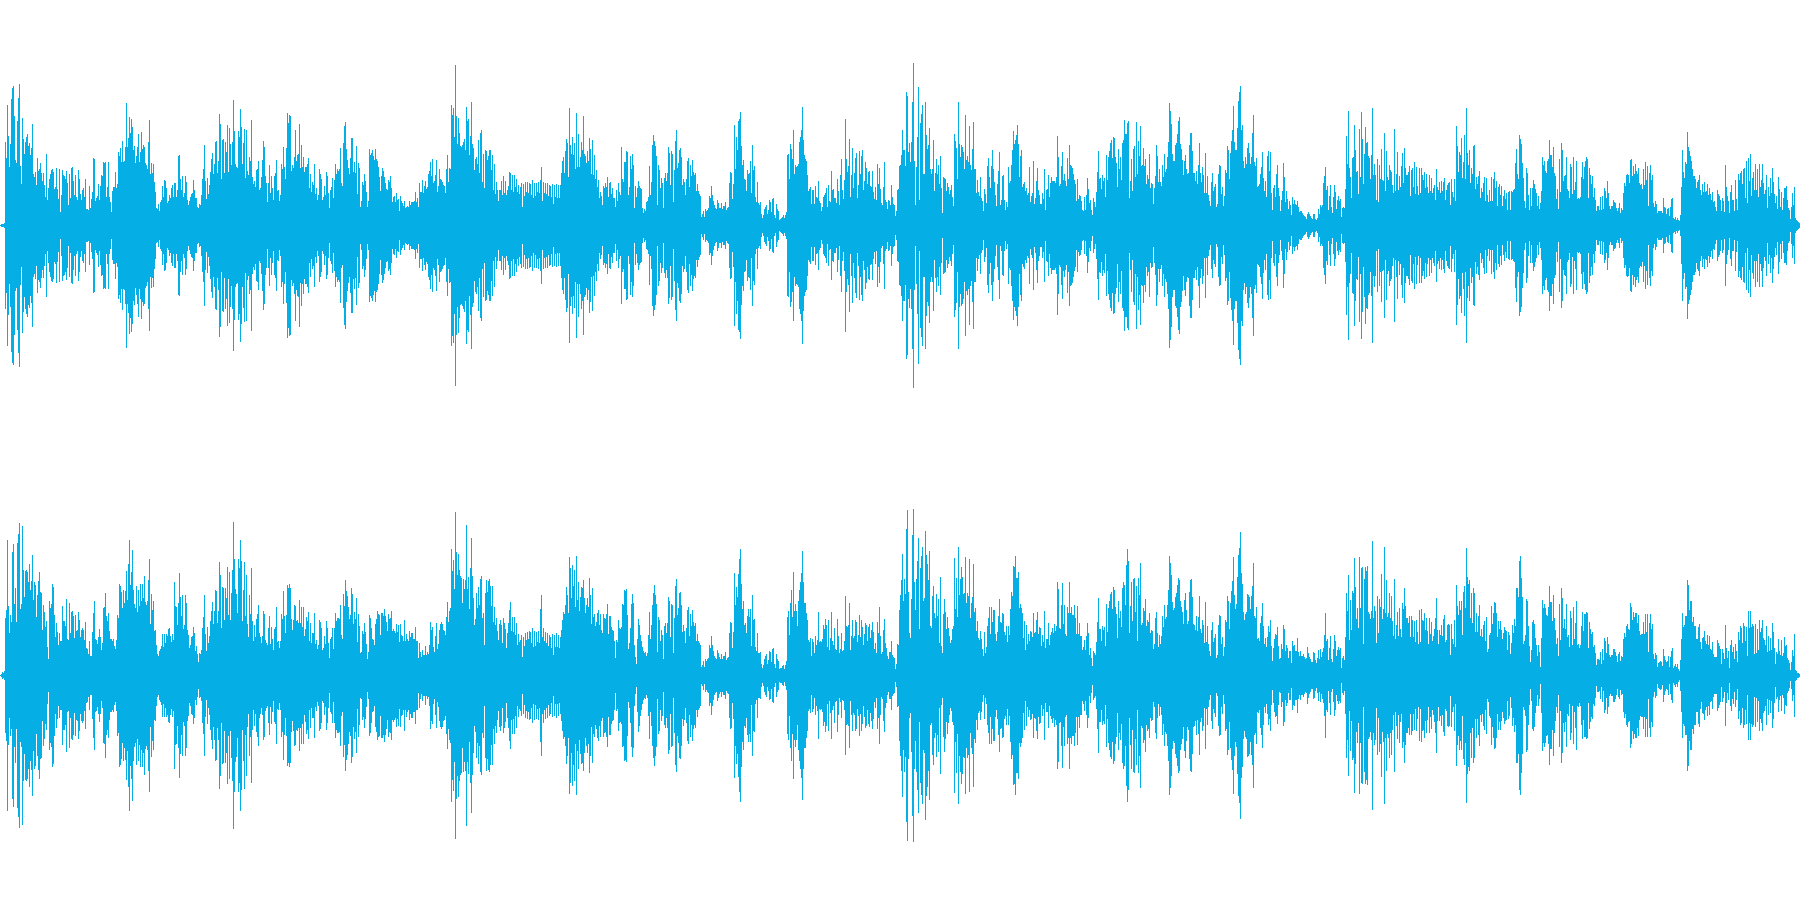 BGMとして何にでもつかえるループの再生済みの波形